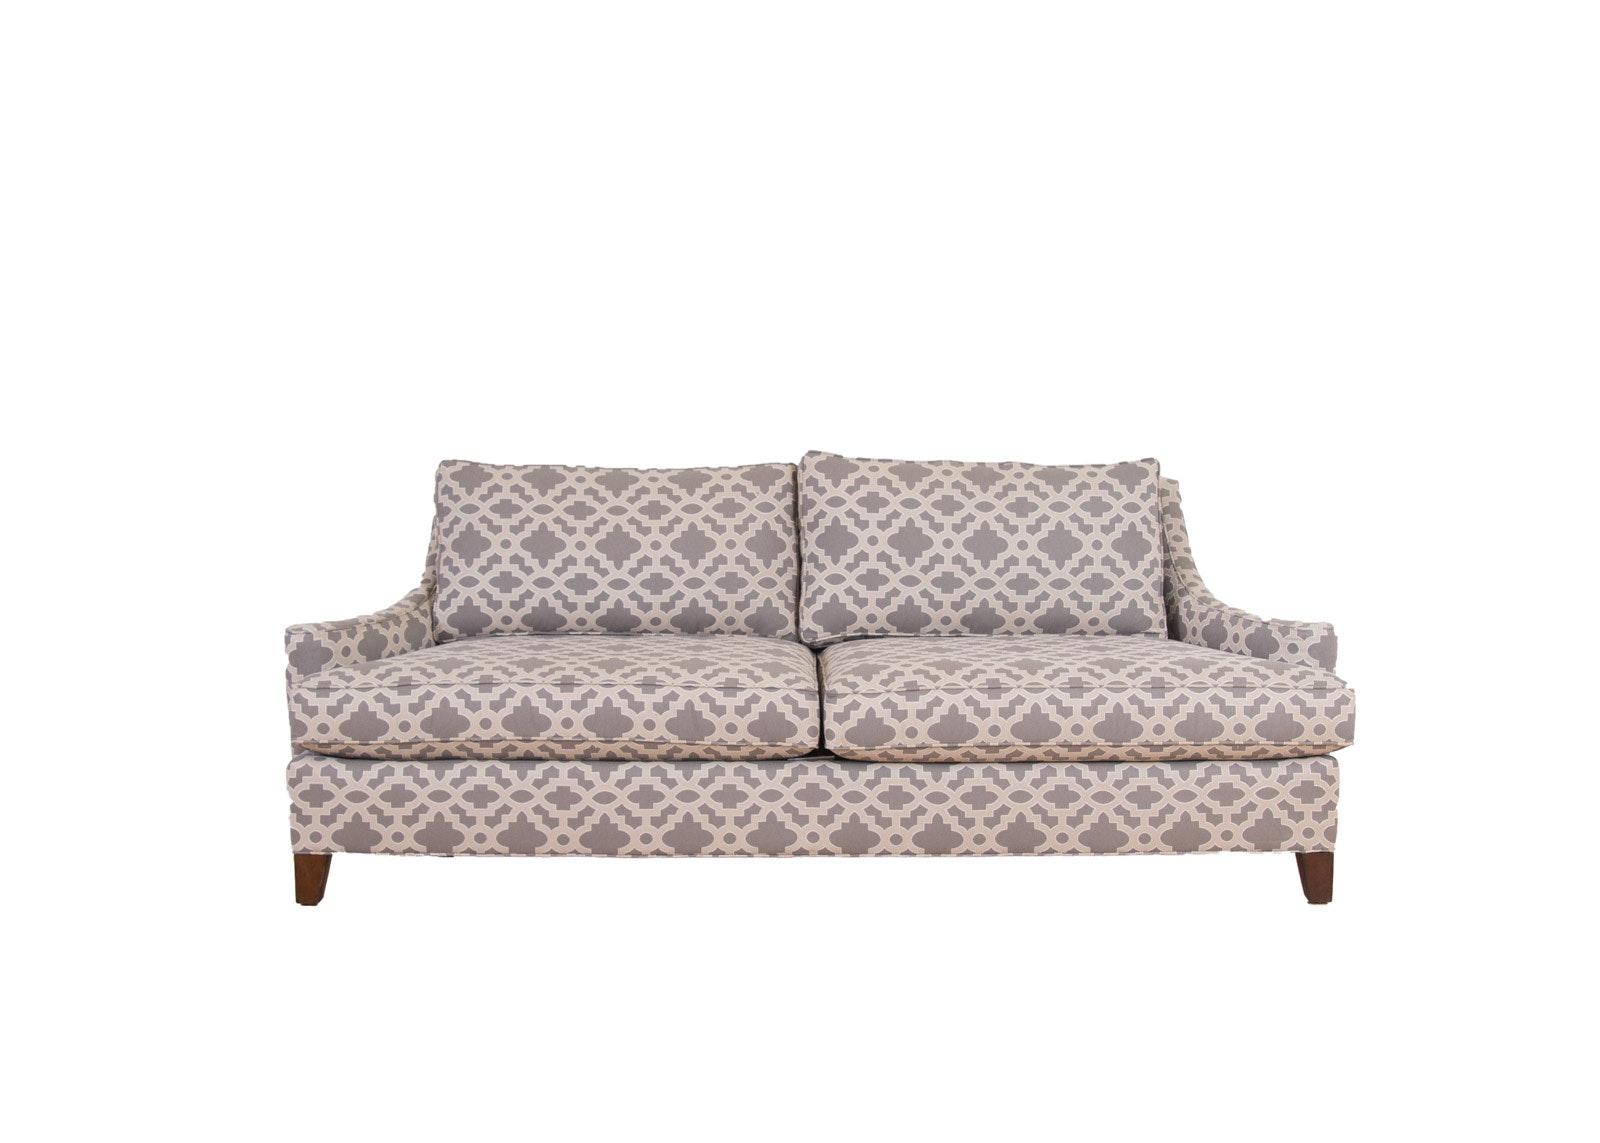 A Highland House Candice Olson Designed Pyper Sofa ...